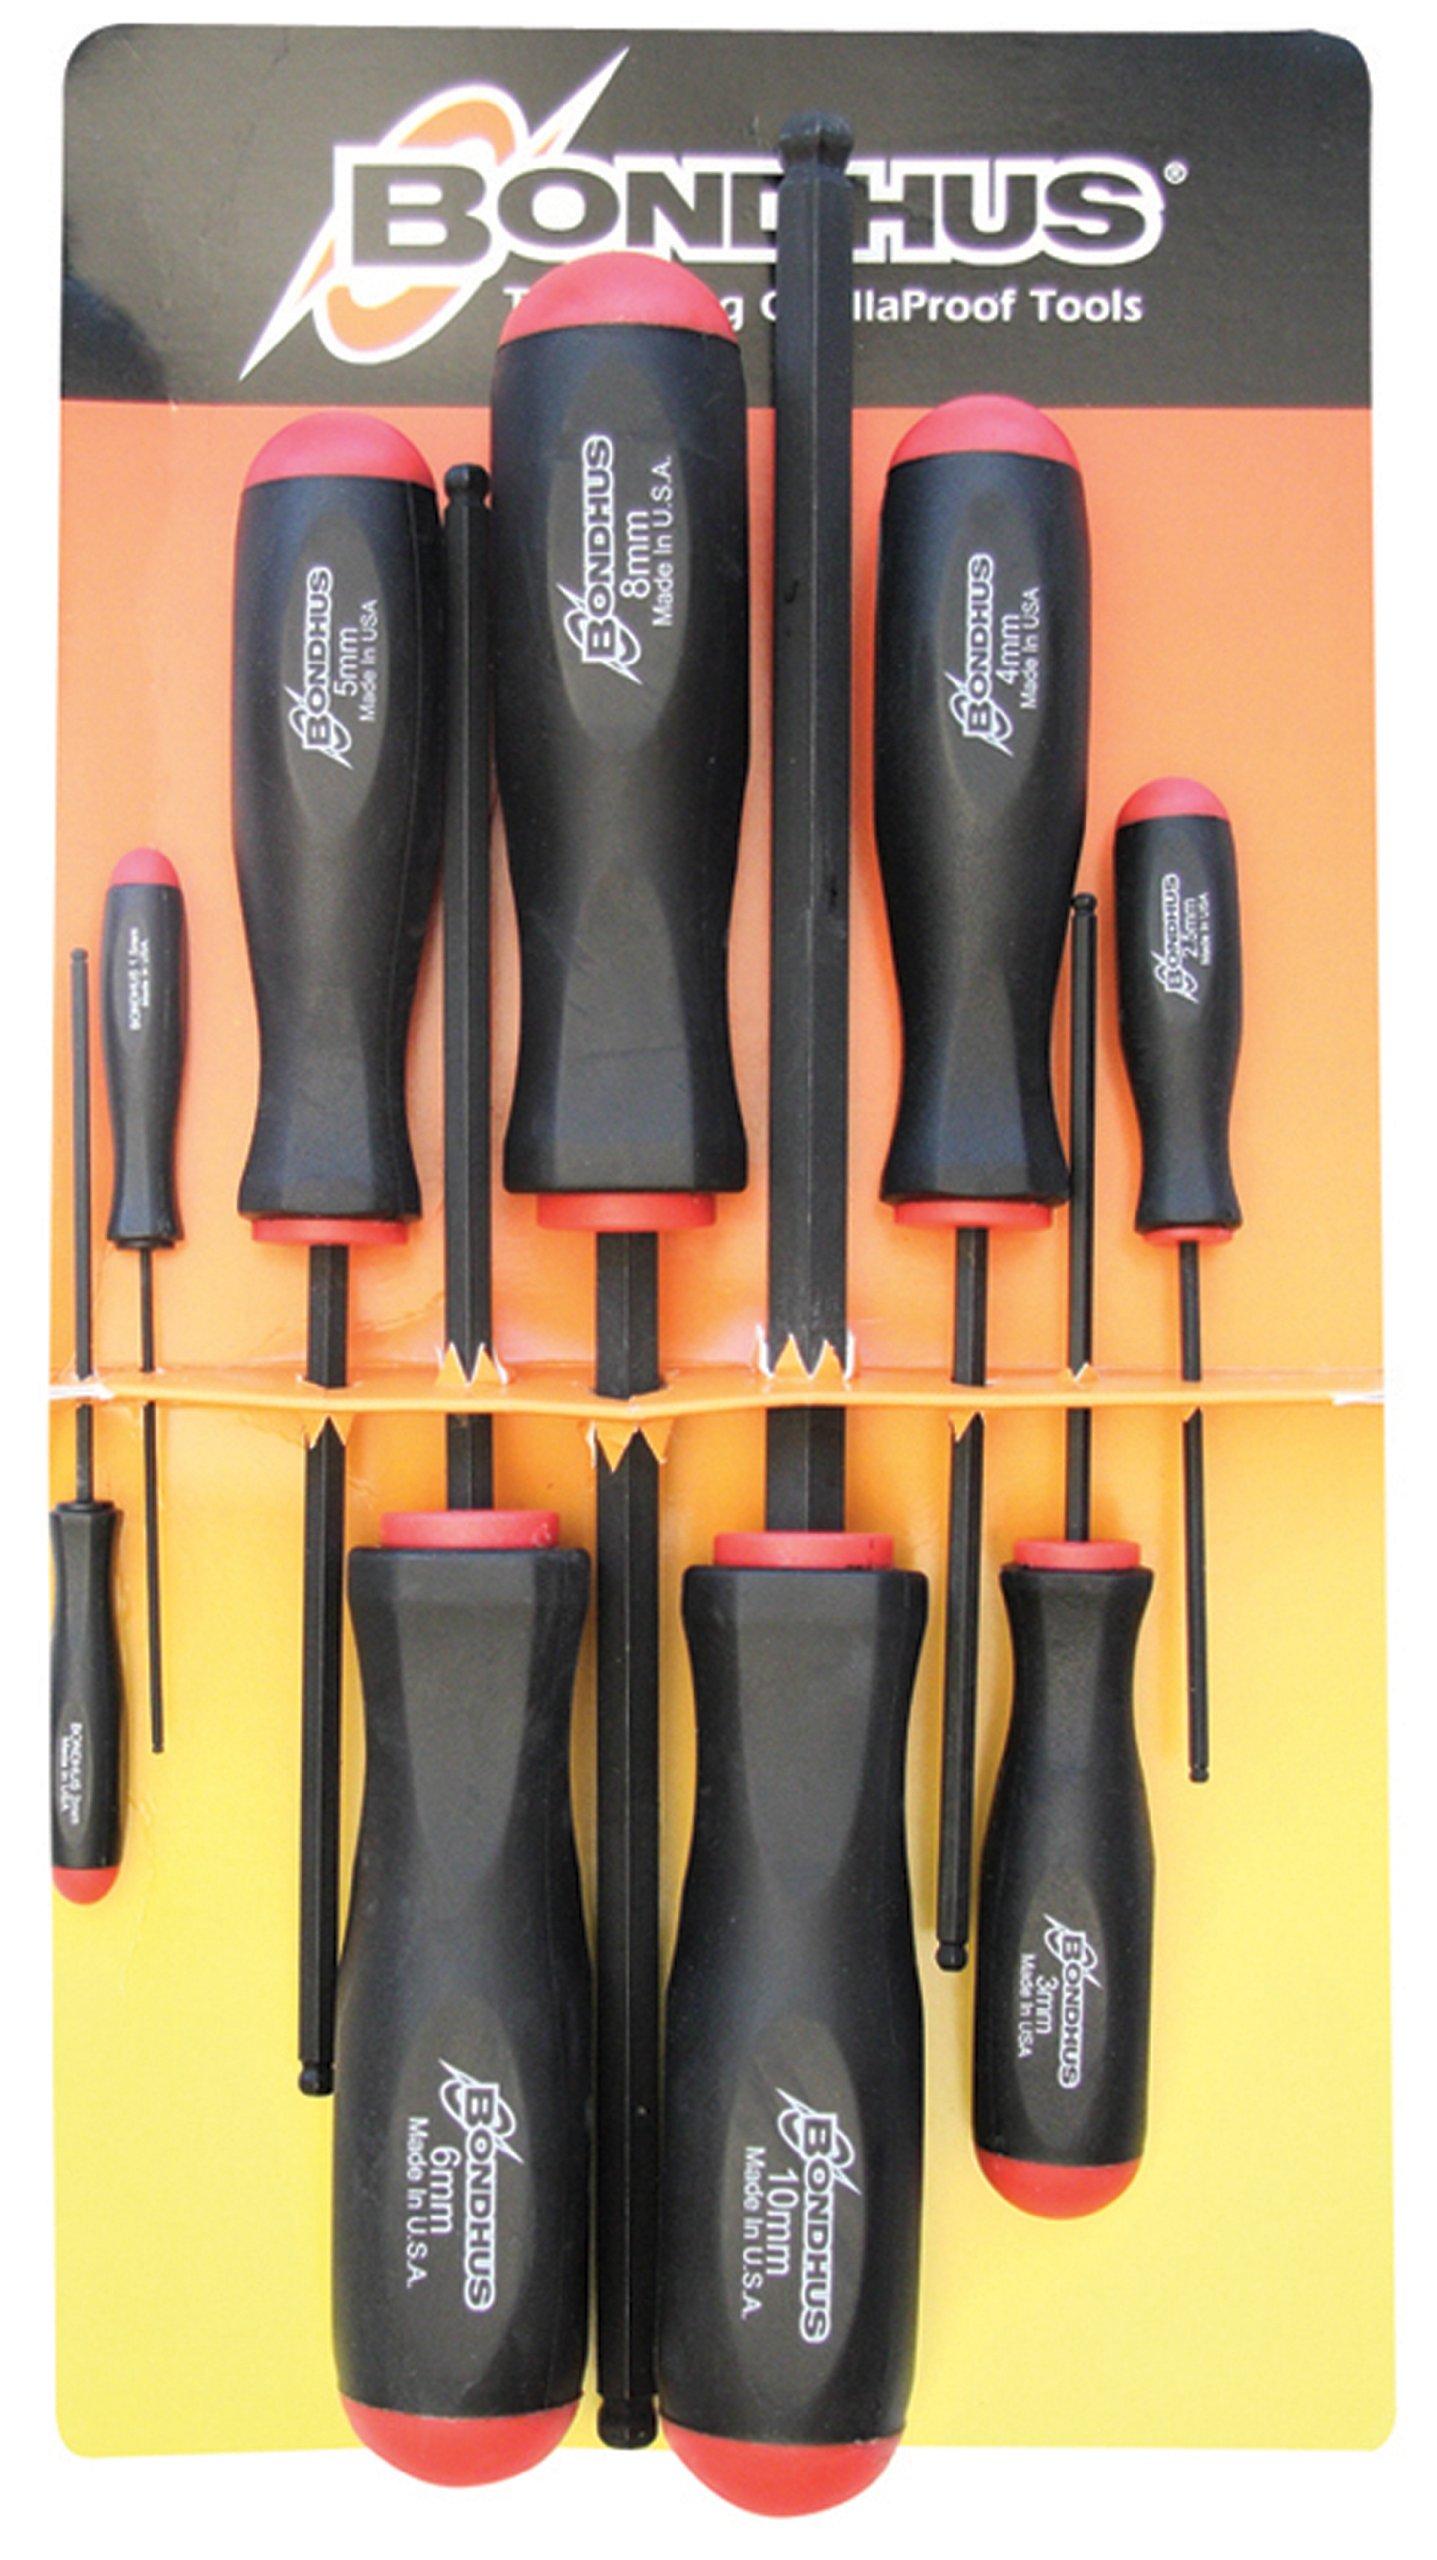 Bondhus 10699 Set of 9 Balldriver Screwdrivers, ProGuard Finish, sizes 1.5-10mm by Bondhus